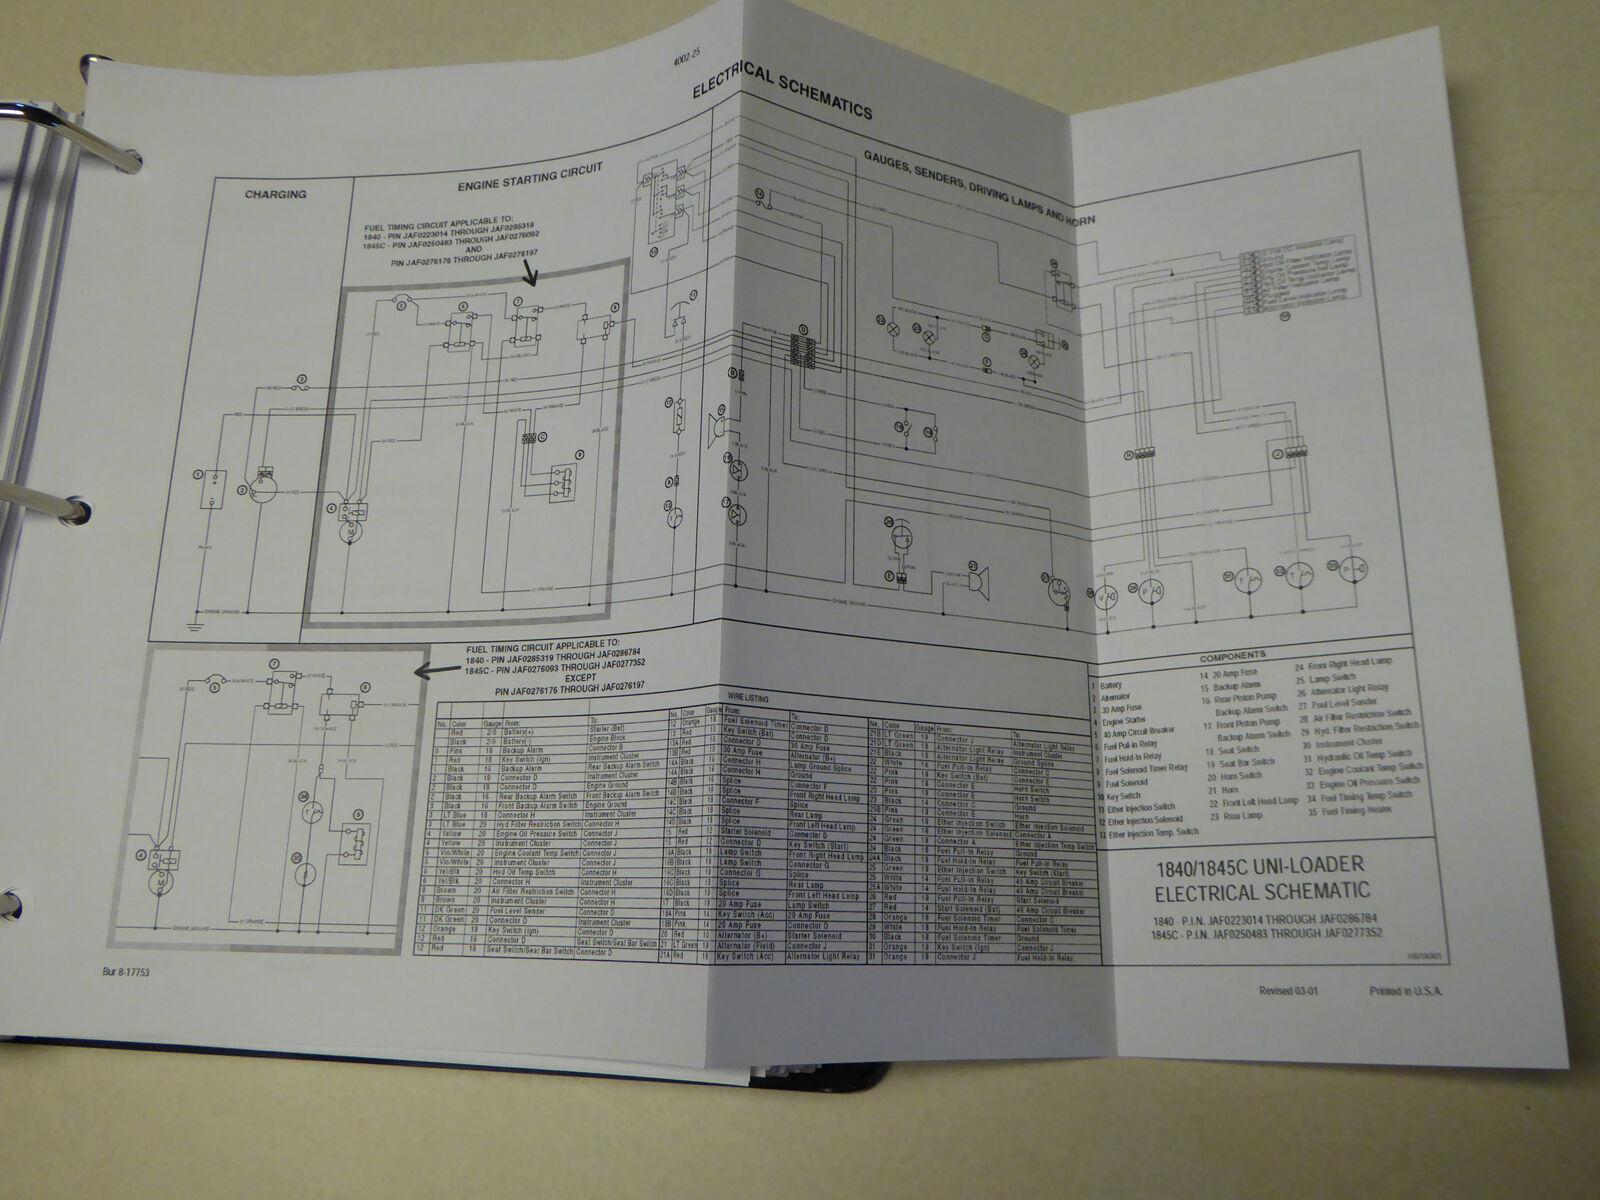 Sensational Case 1845C Uni Loader Skid Steer Service Repair Manual For Sale Wiring 101 Taclepimsautoservicenl